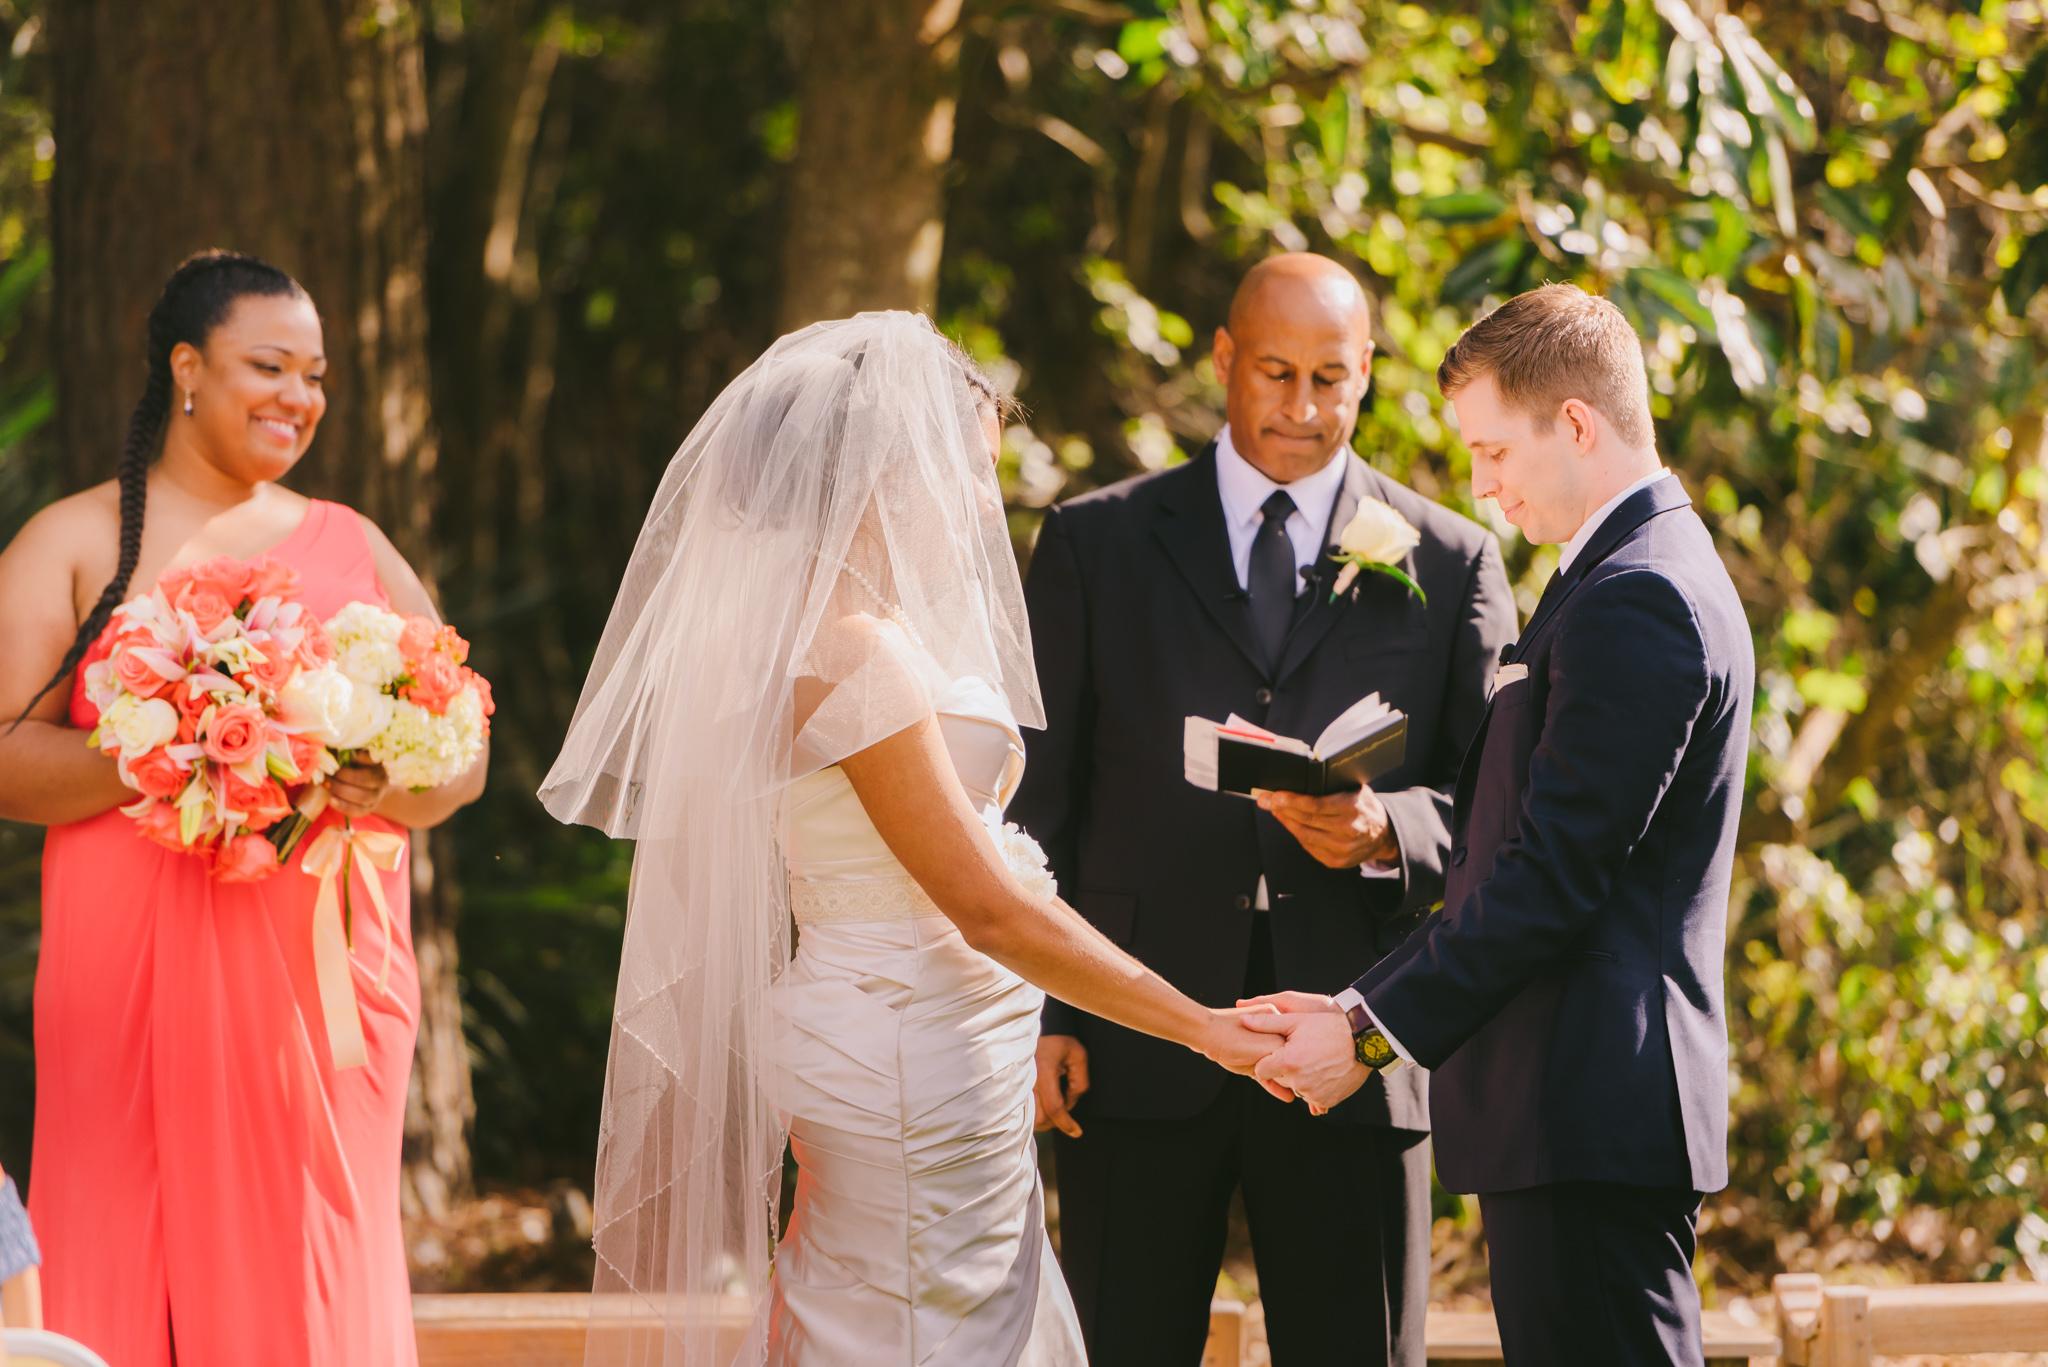 Hozik_Wedding-432.jpg